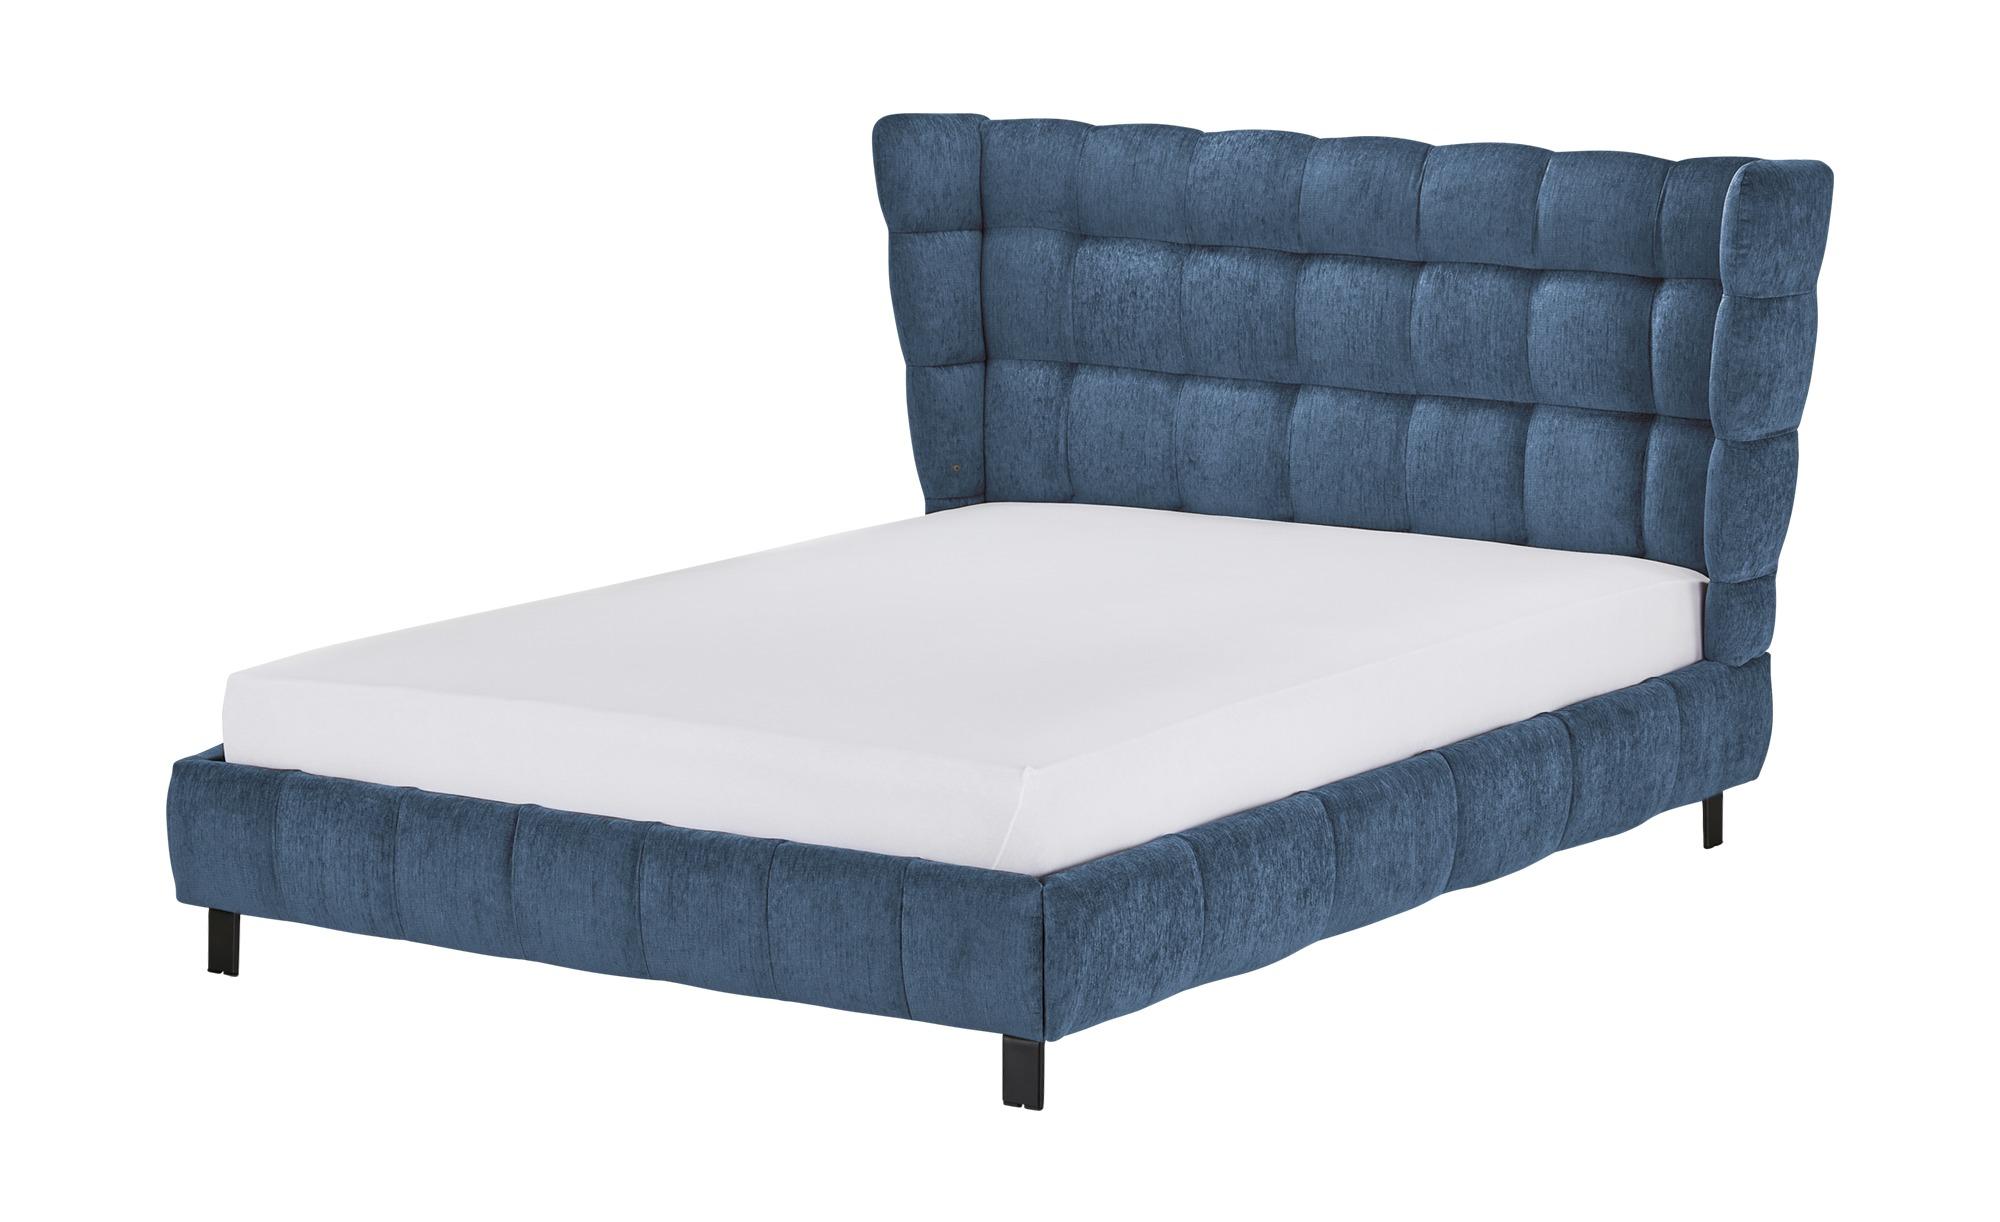 Polsterbettgestell 180x200 - blau Caterham ¦ blau ¦ Maße (cm): B: 208 H: 109 T: 214 Betten > Polsterbetten - Höffner